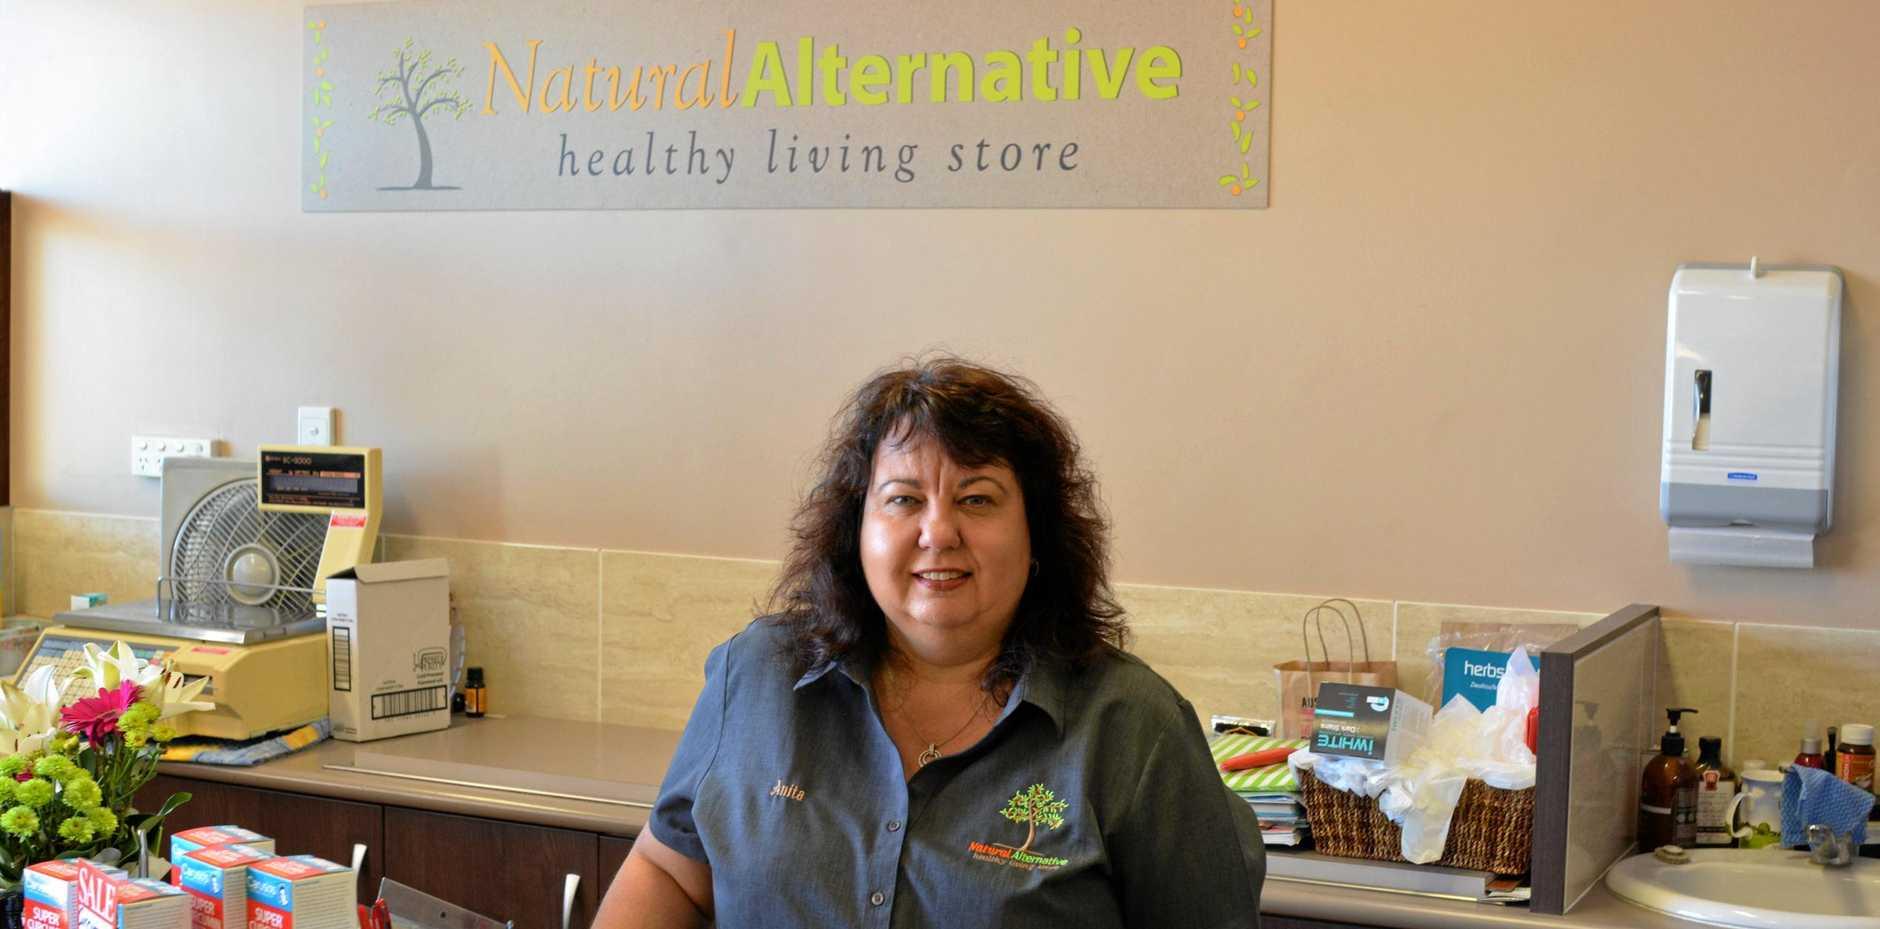 CONGRATULATIONS: Anita Lyne celebrates 10 years of business in Gatton.